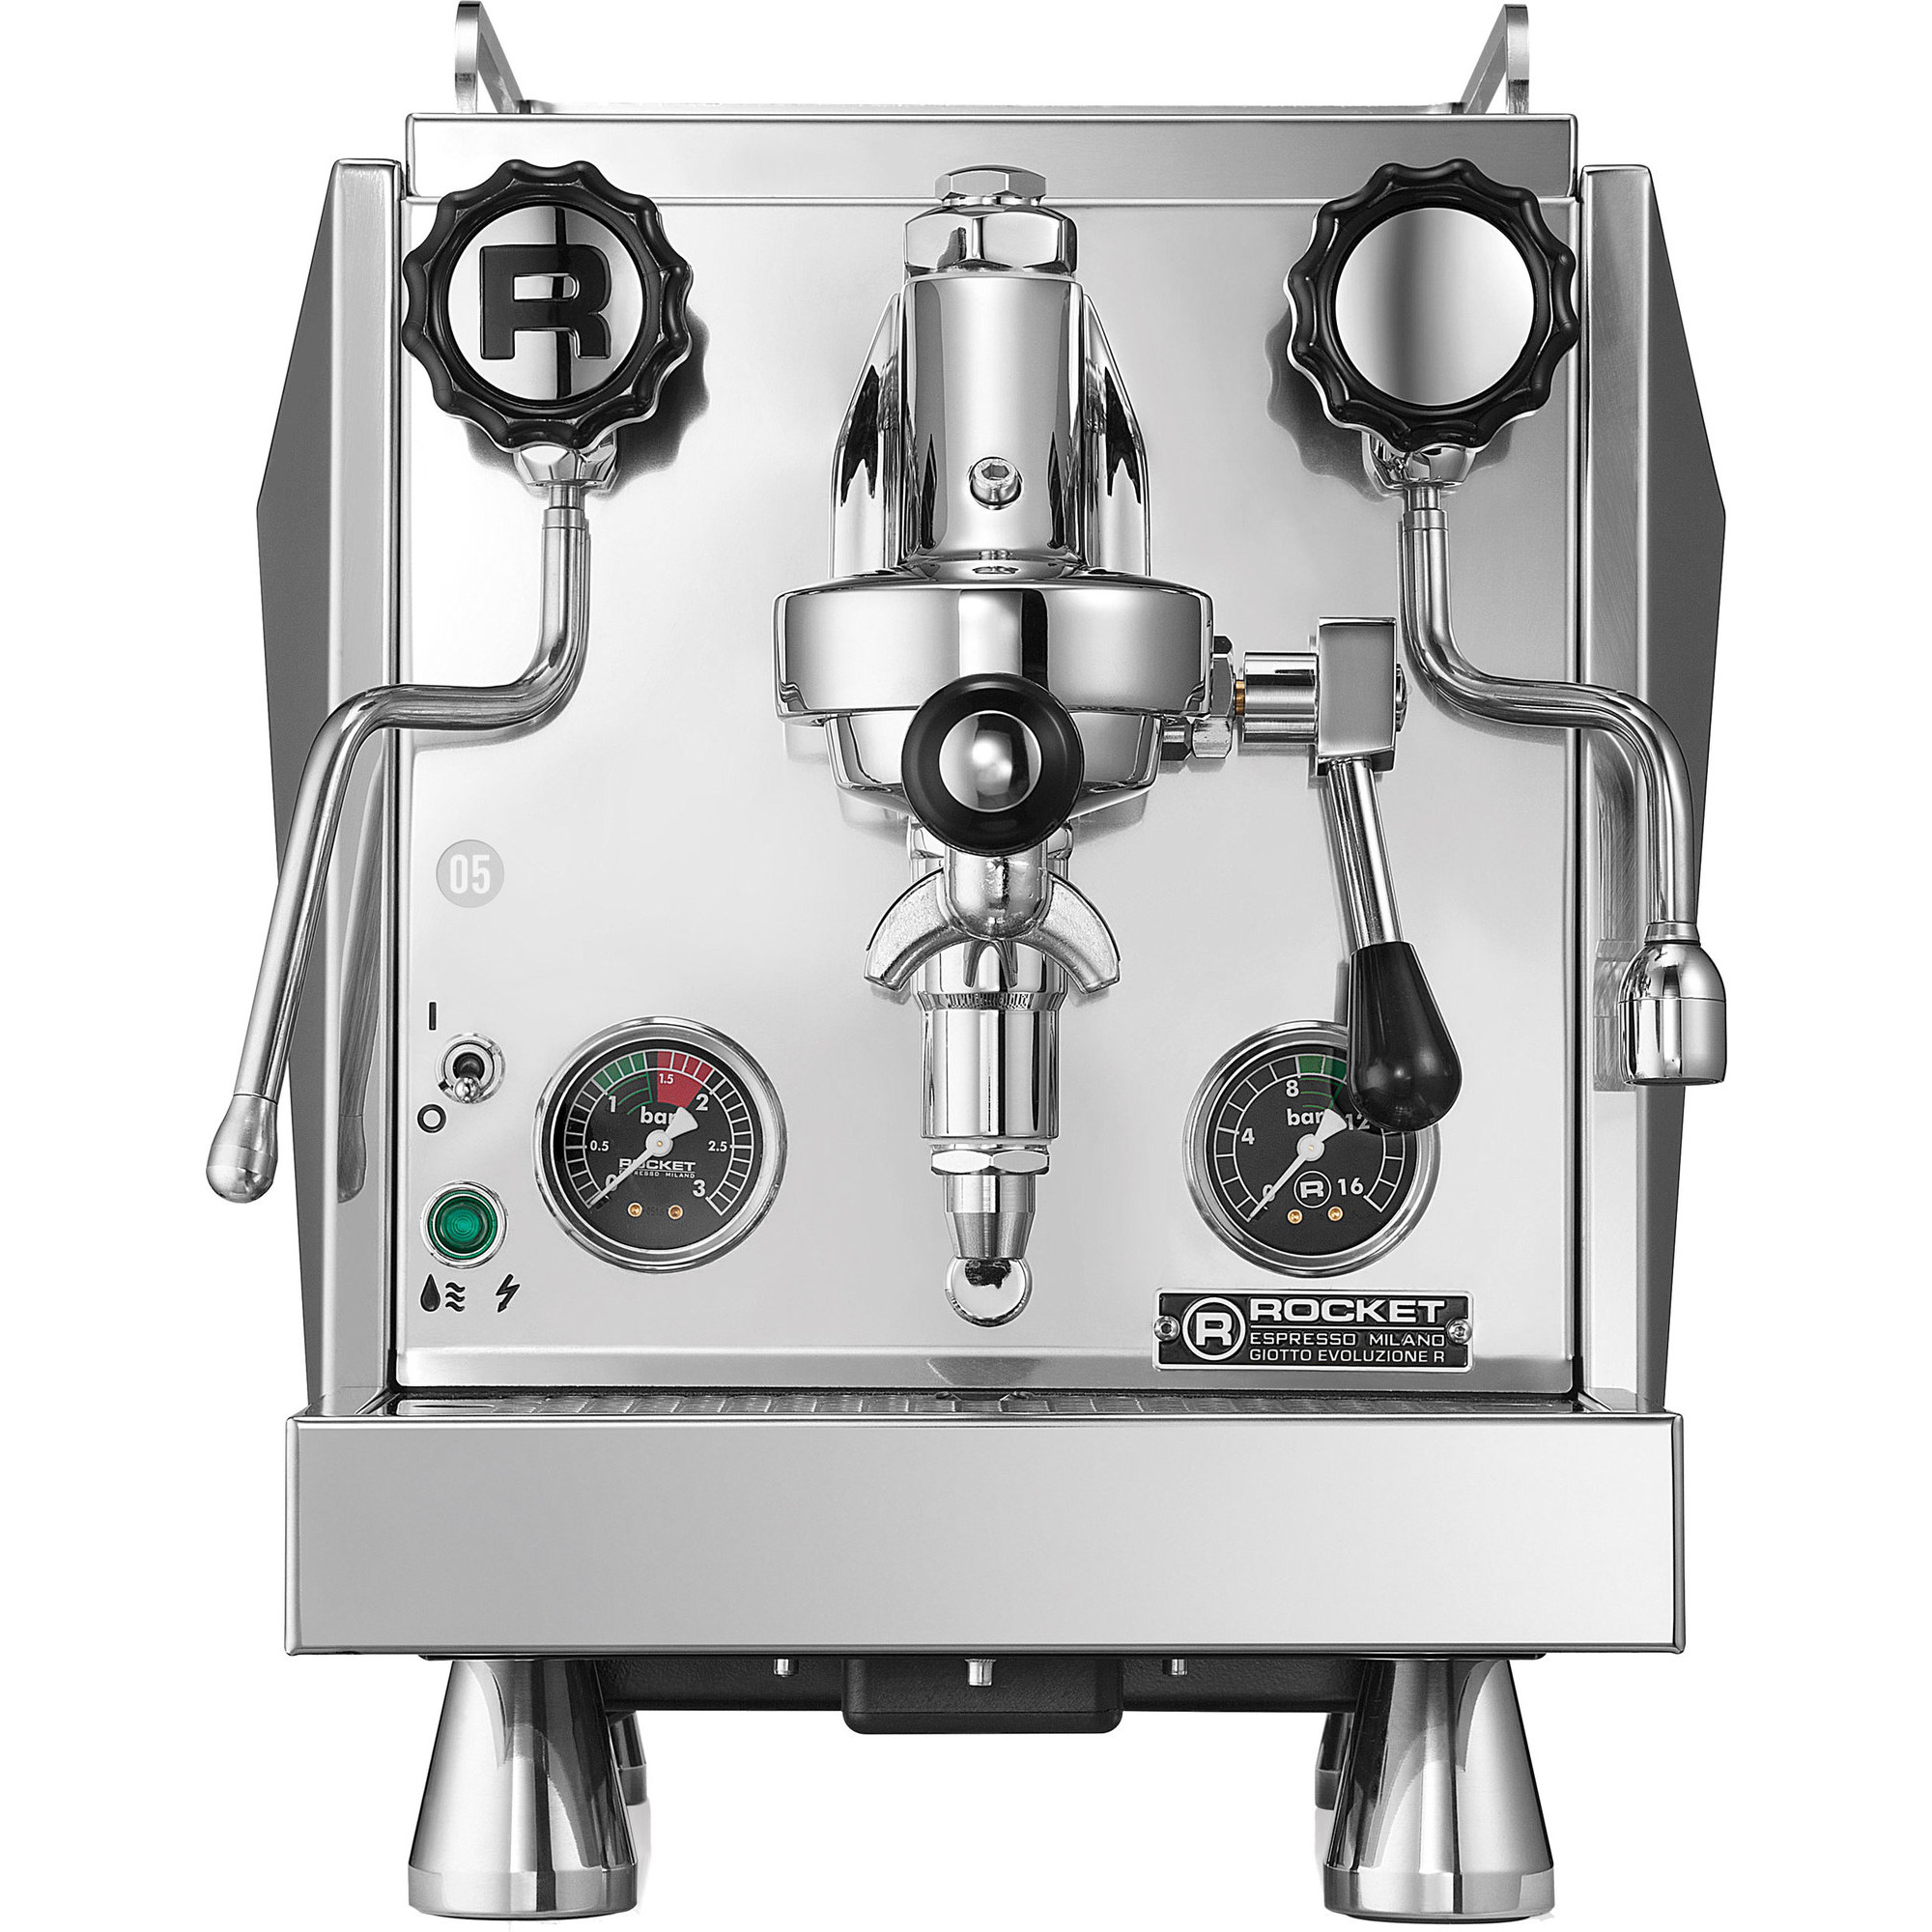 Rocket Giotto Cronometro Espressomaskin